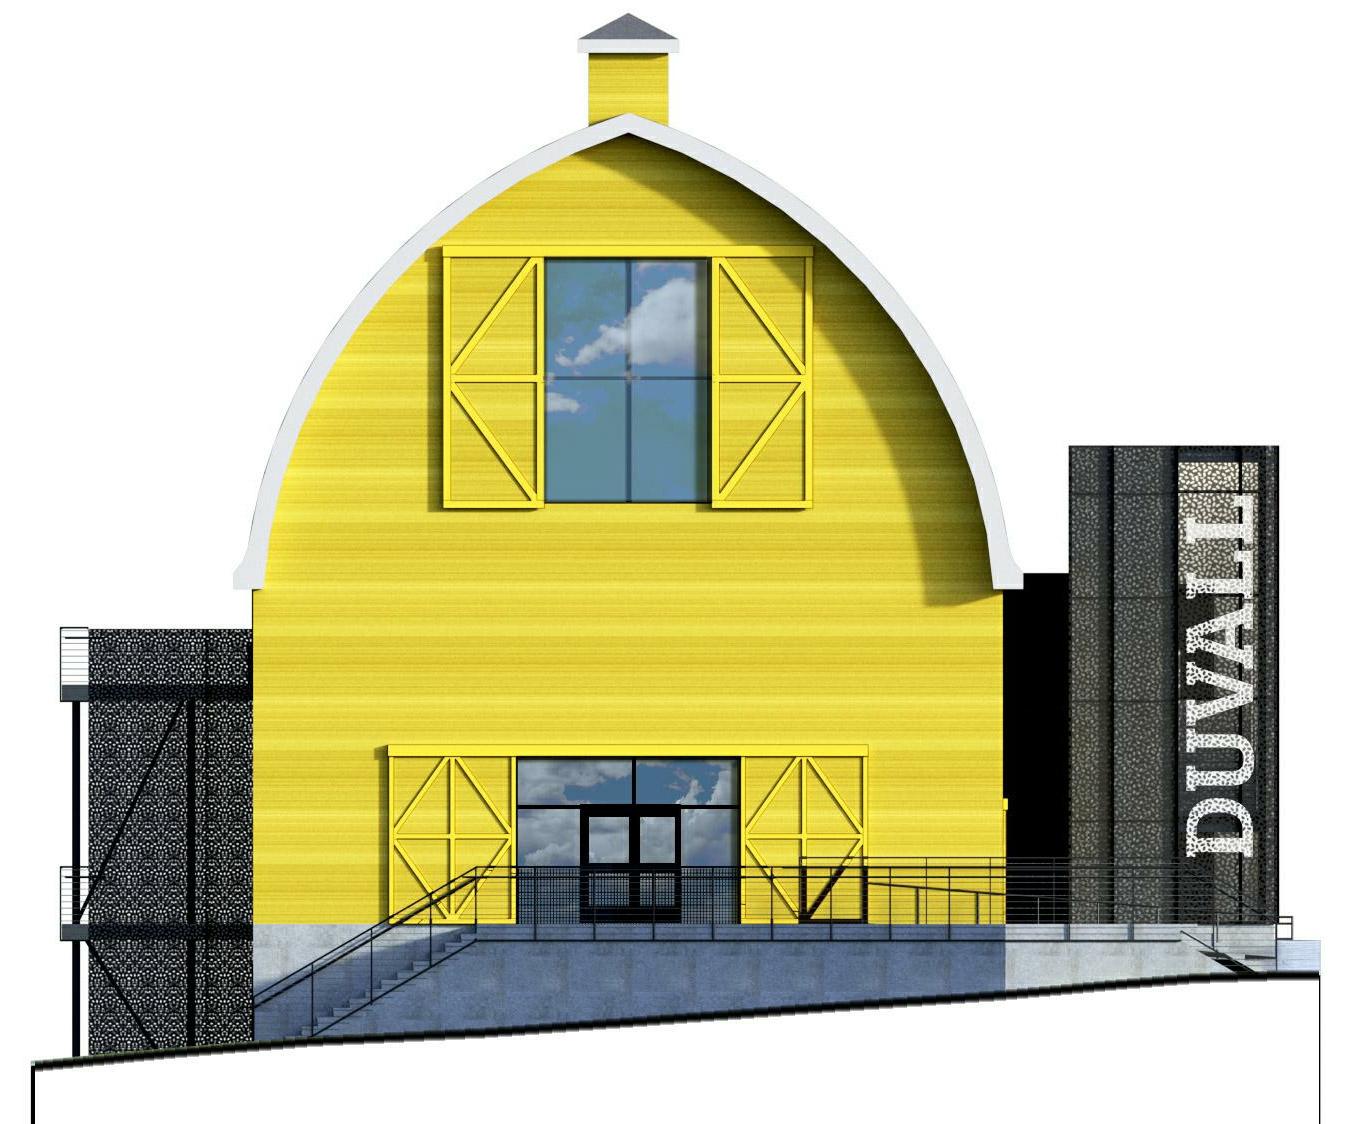 Duvall Community Arts Center